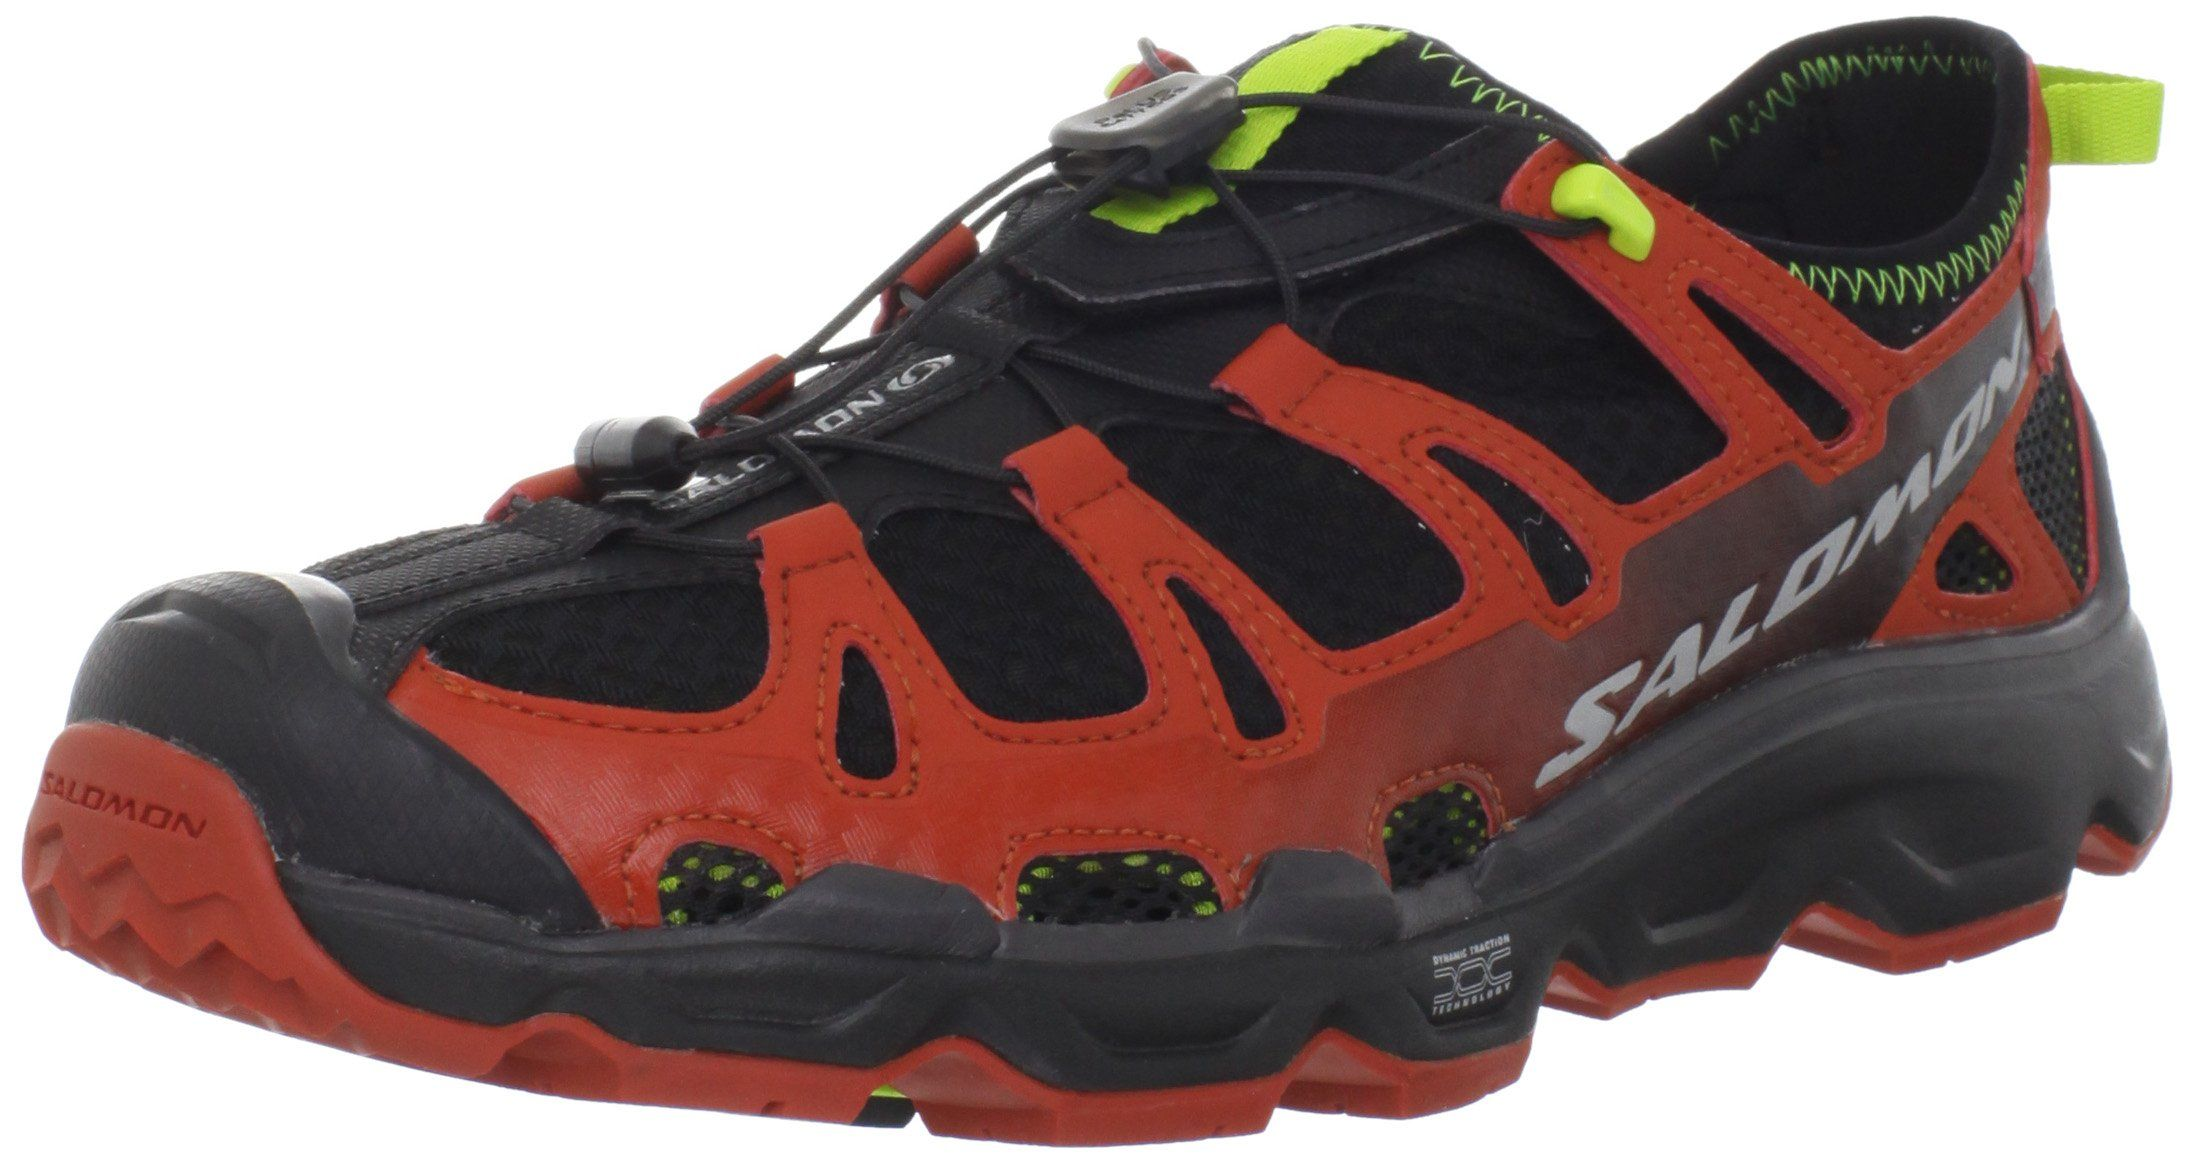 Salomon Mens Rx Gecko Crosscountry Shoeblack Moab Orange Green9 M Us Click Image For More Det Cross Country Shoes Running Shoes For Men Black Shoes